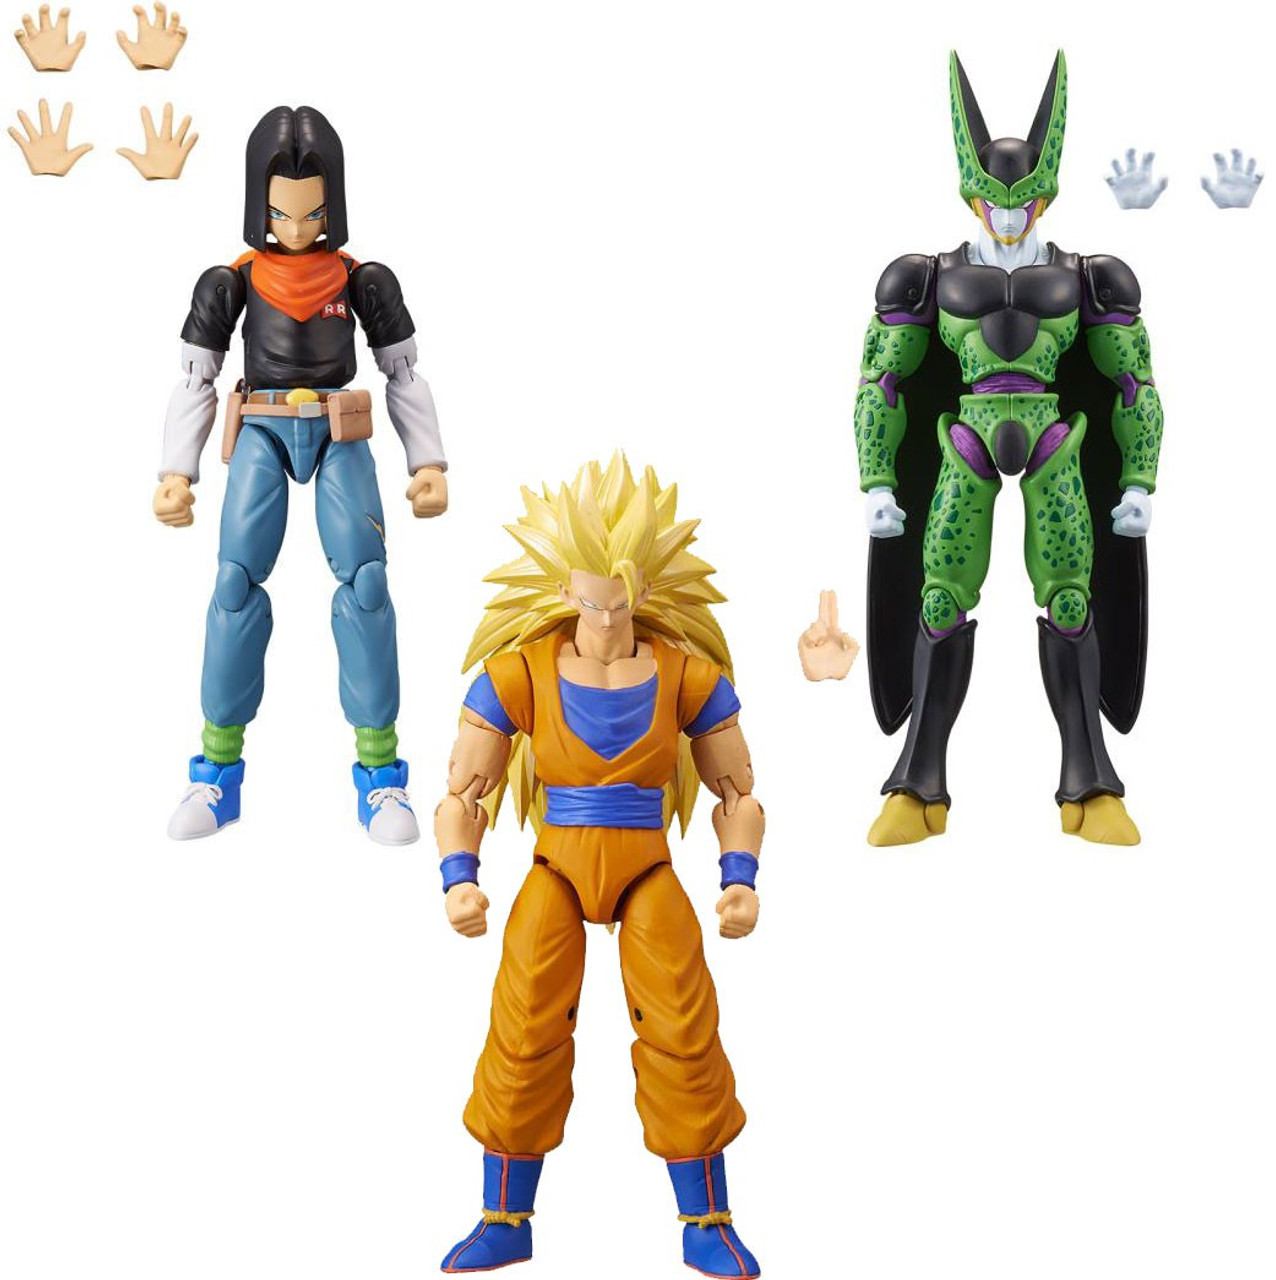 Dragon Ball Super Dragon Stars Series 10 Android 17 Super Saiyan 3 Son Goku Perfect Cell Set Of 3 Action Figures Build A Figure